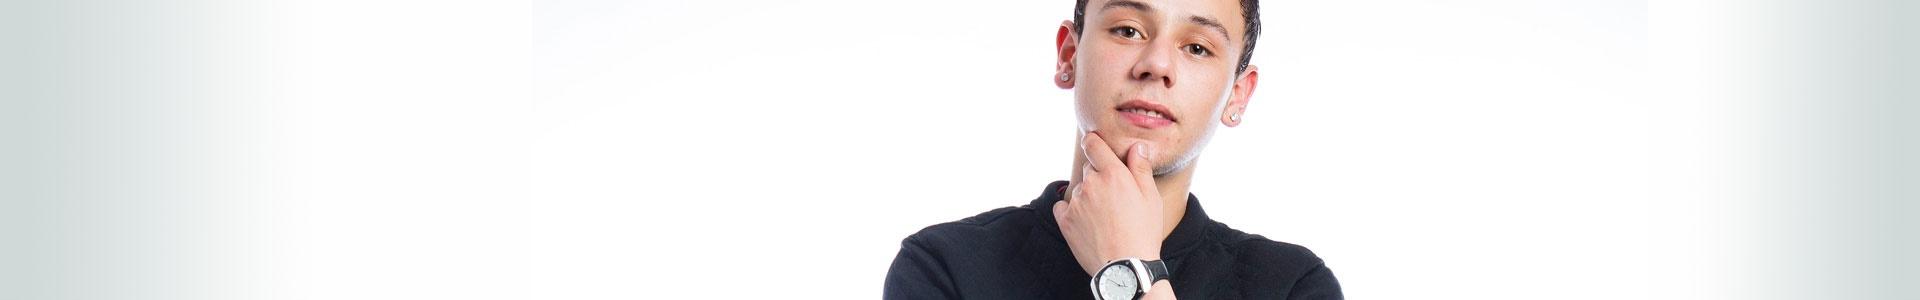 COM_verkoopmedewerker-NIV2_DRVE2014-WILLIAM